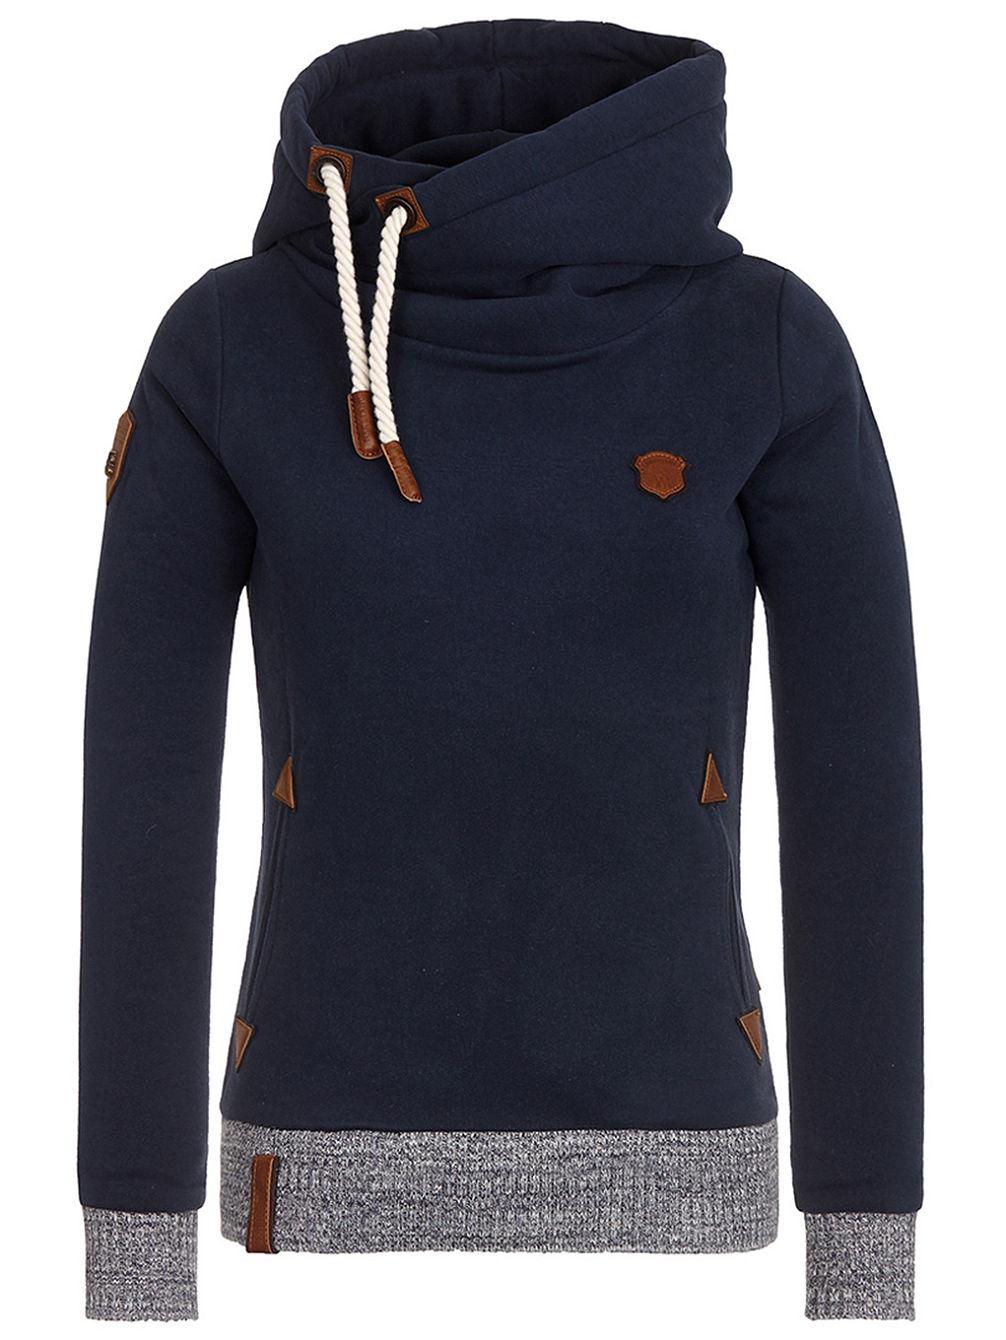 naketano-the-dark-side-hoodie